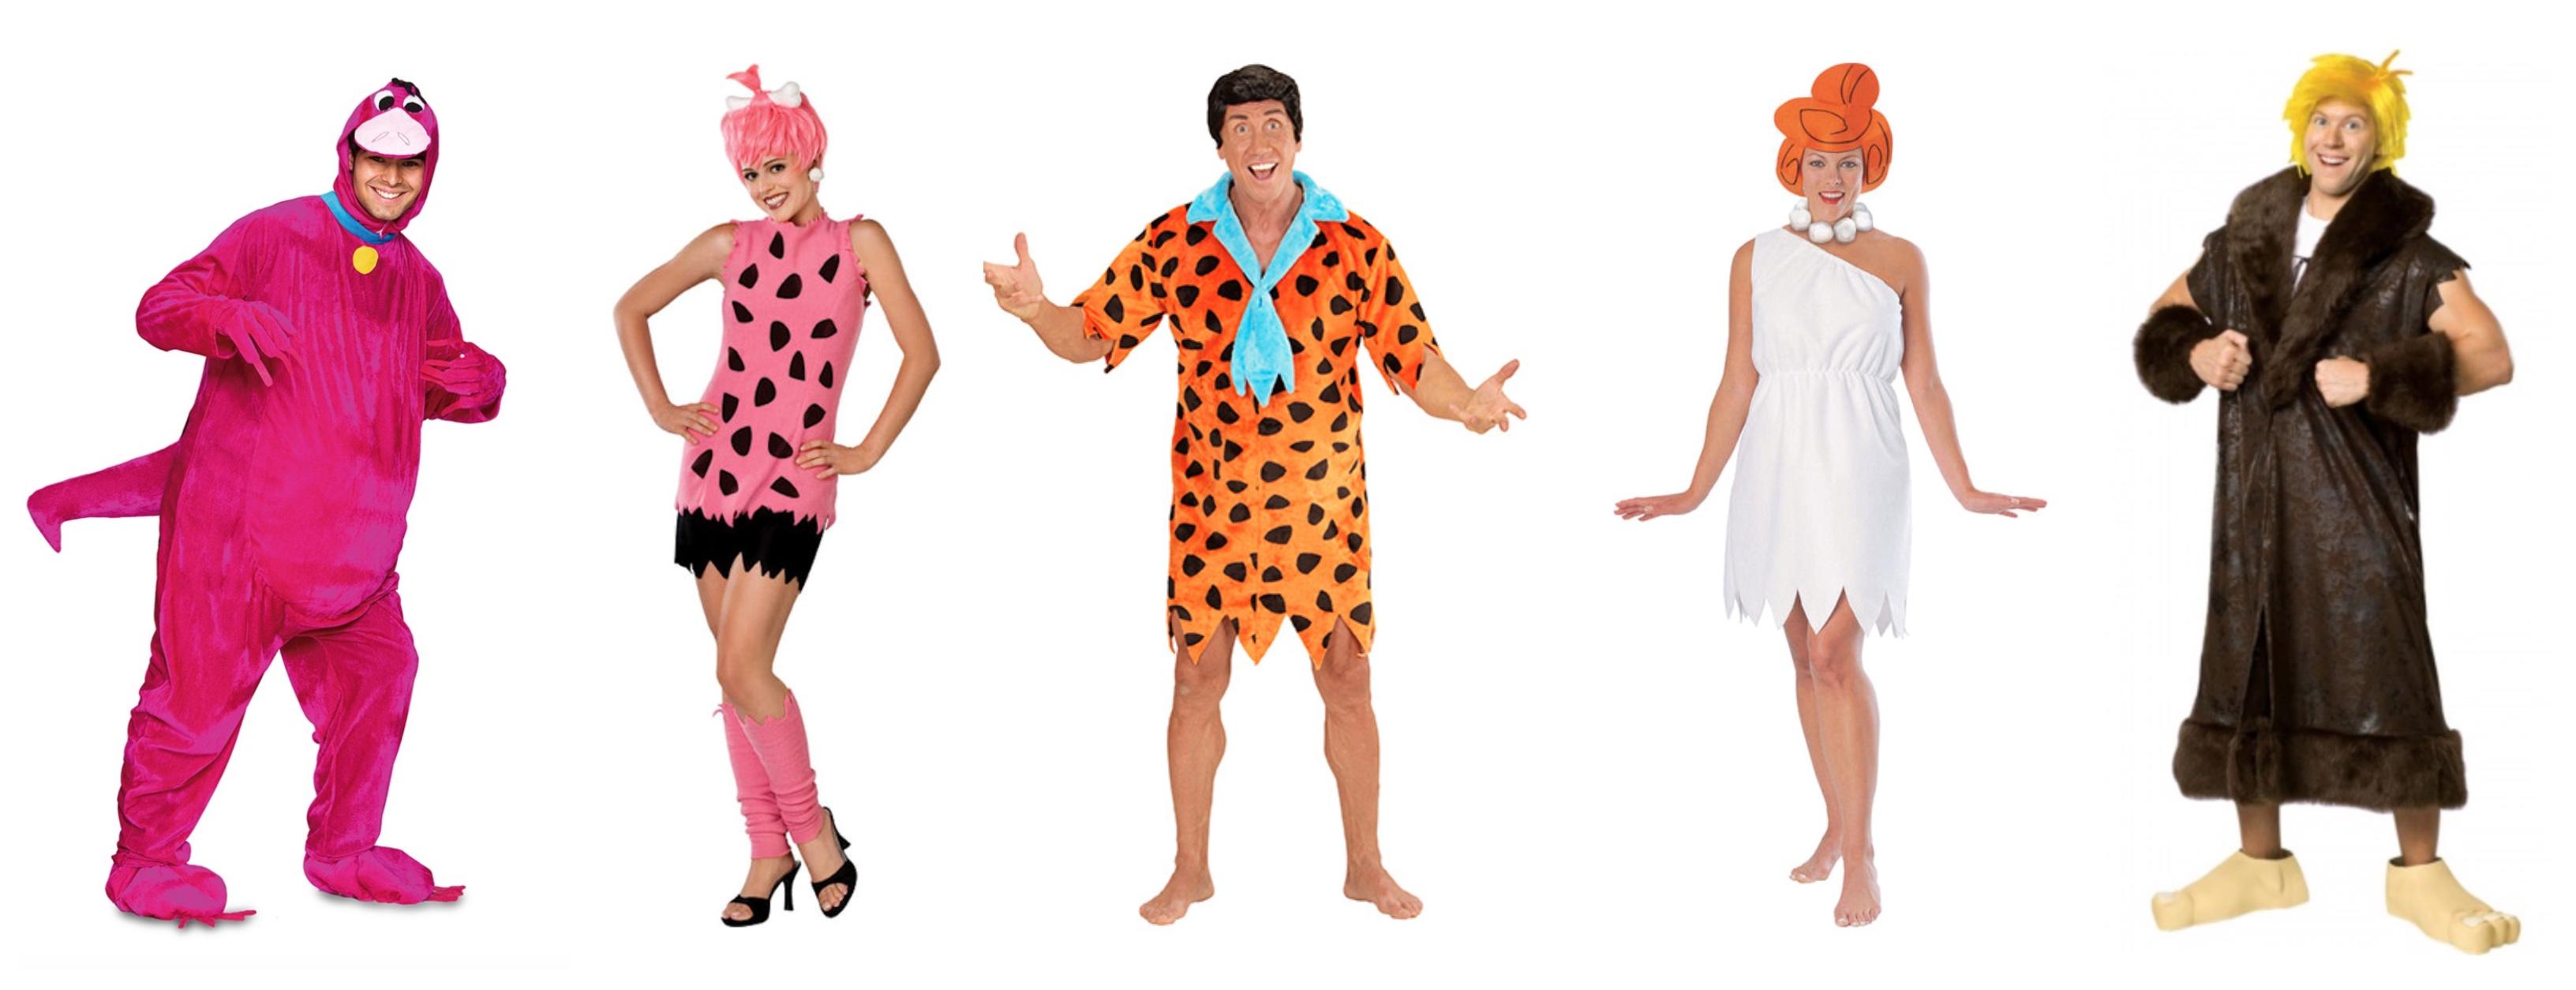 the flintstones kostume til voksne - Flintstones kostume til voksne